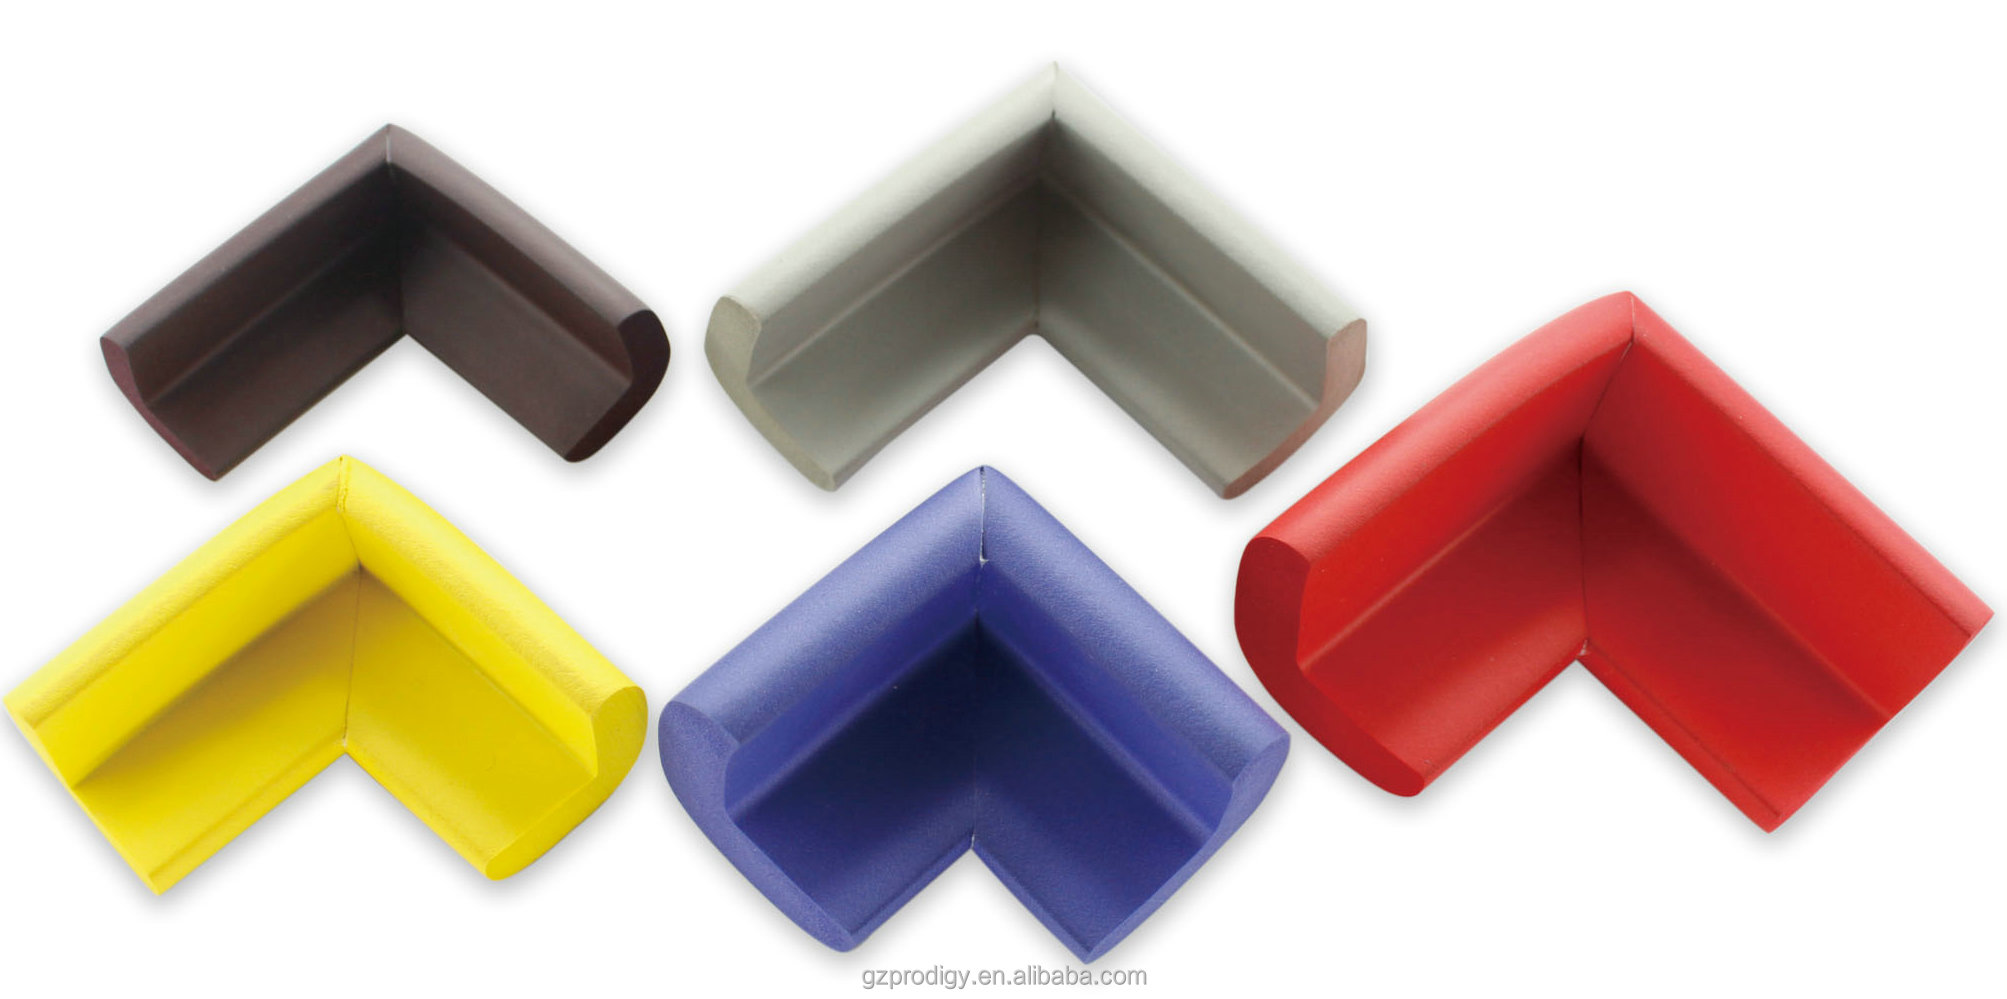 Plastic Sharp Corner Guard Rubber Table Edge Guard Buy